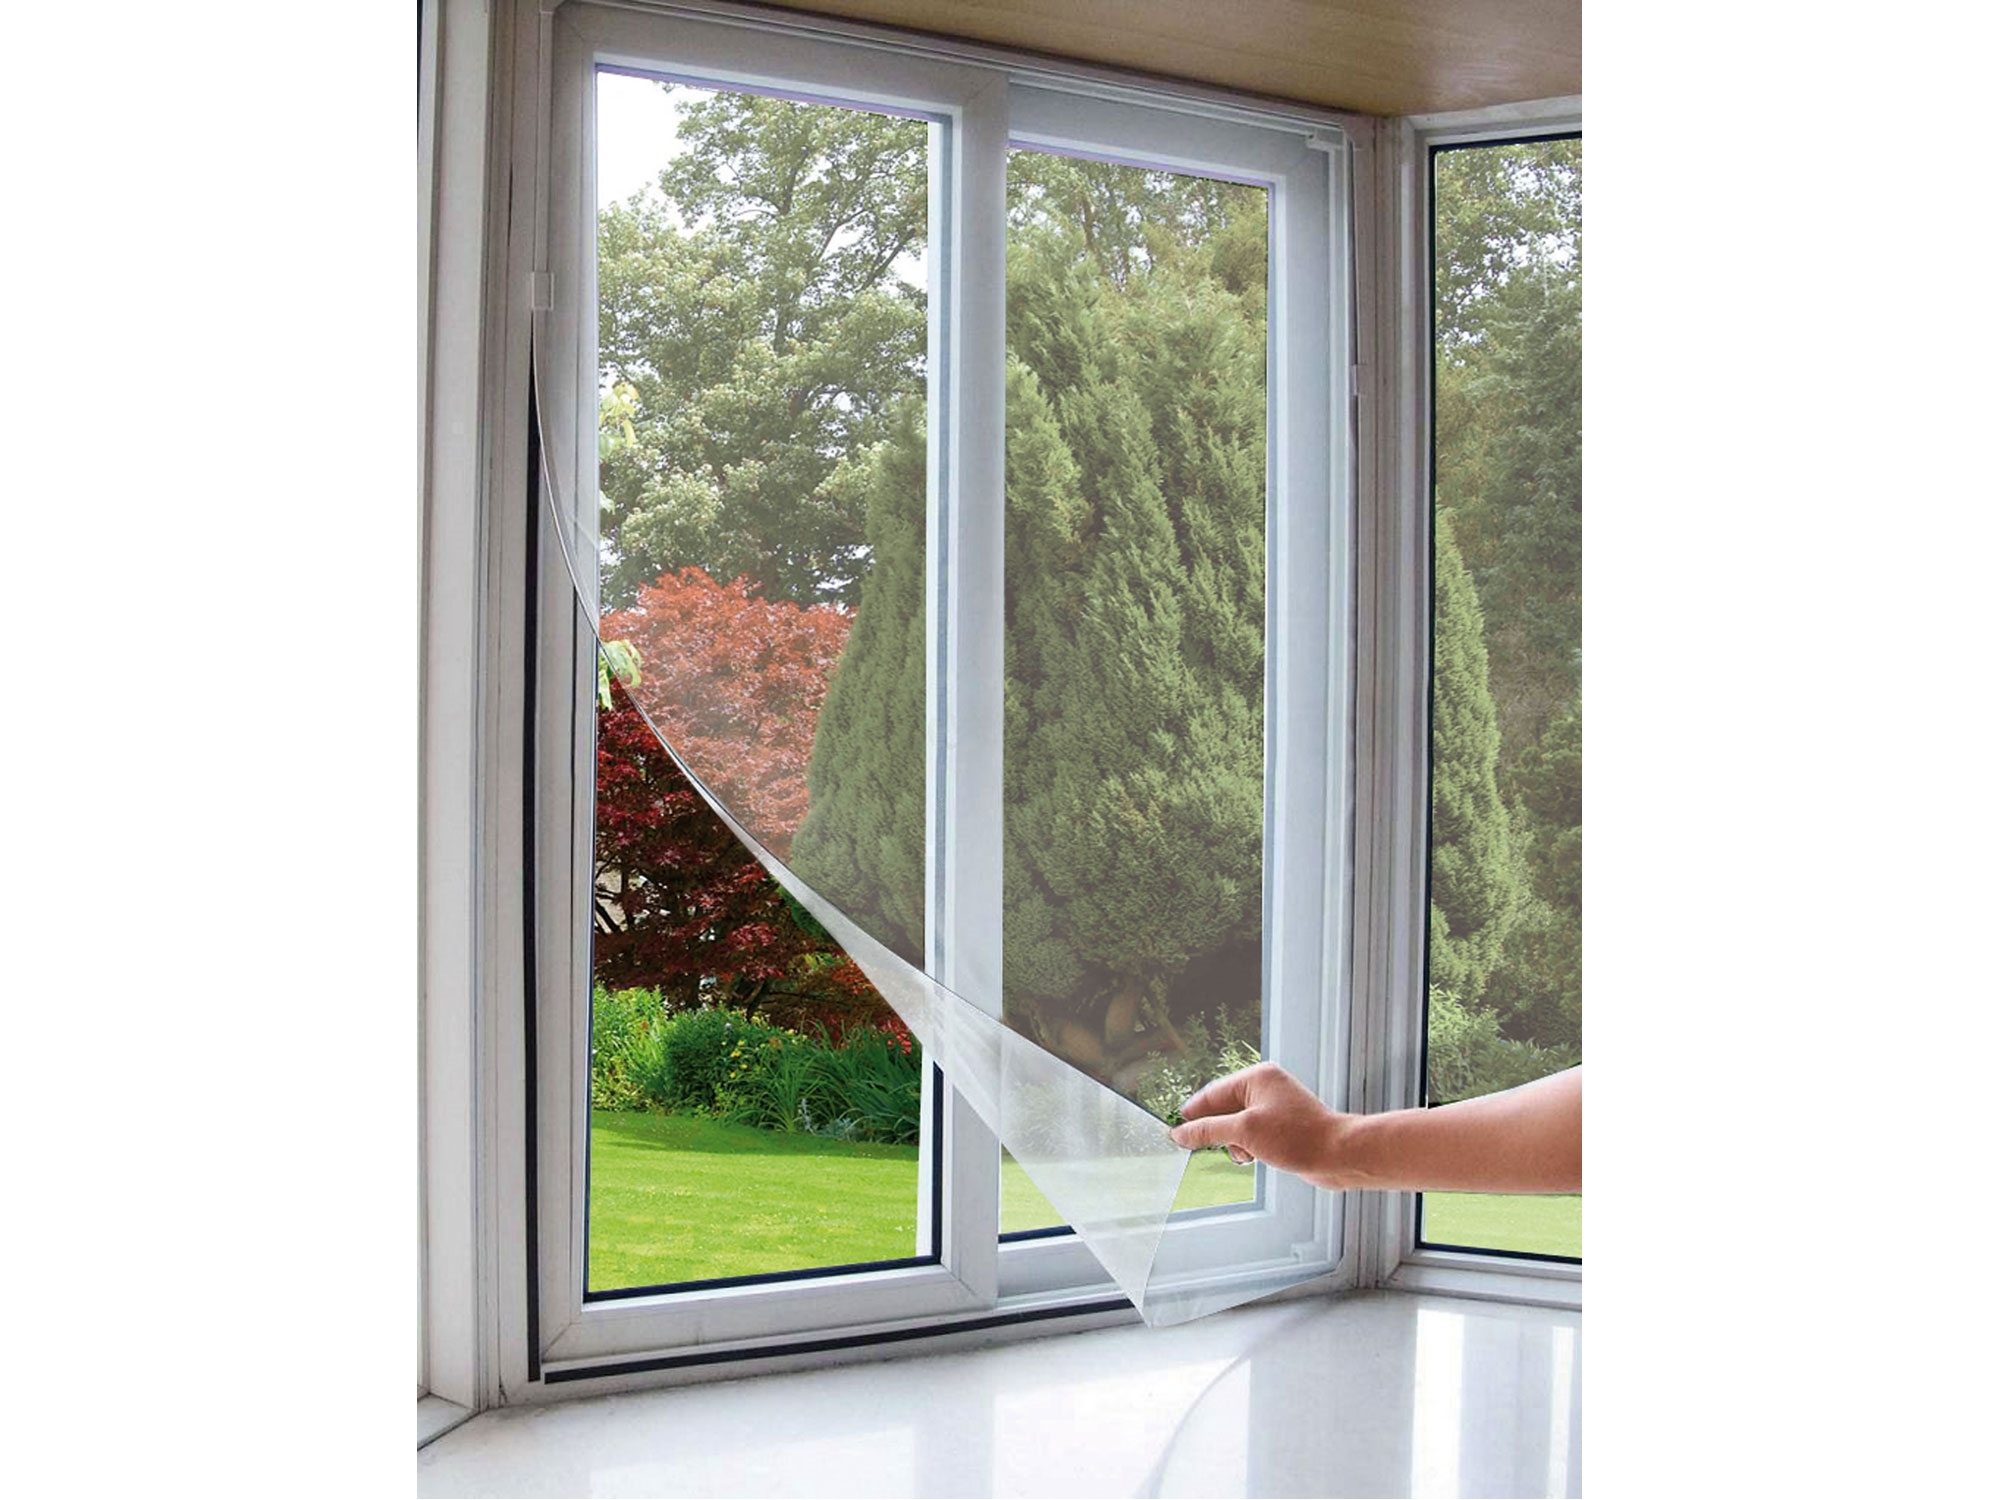 síť okenní proti hmyzu, 150x180cm, bílá, PES, EXTOL CRAFT 99130